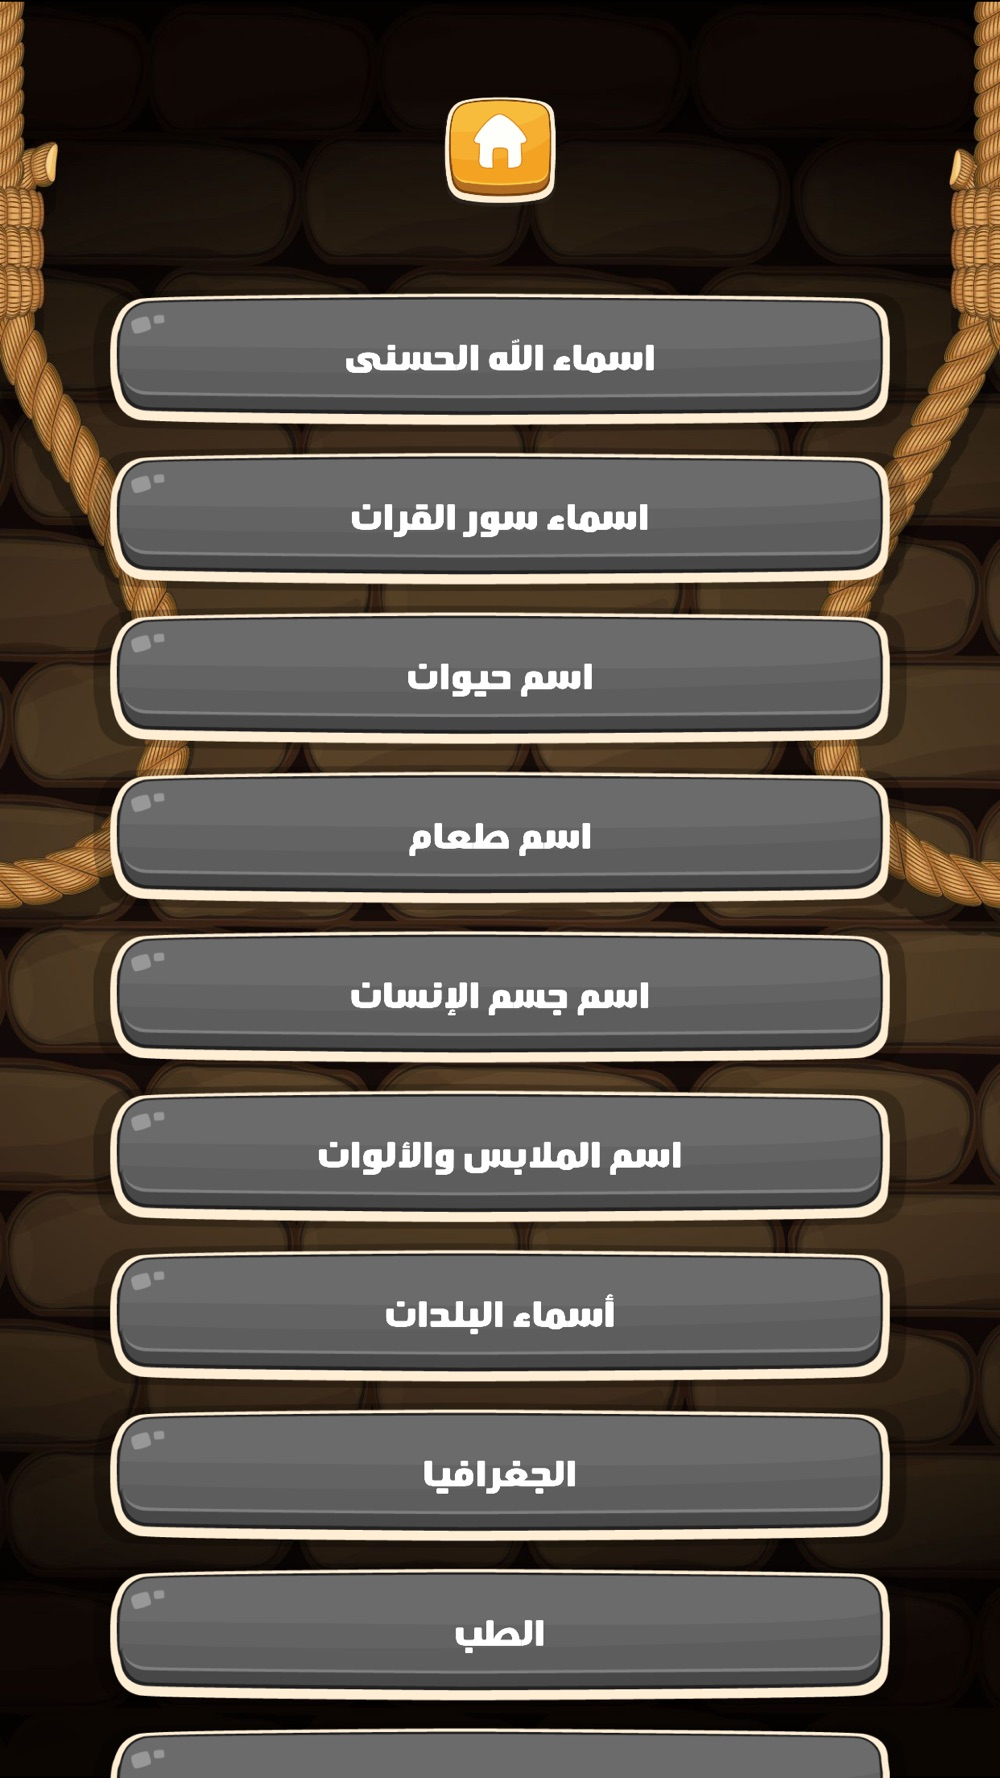 Arabic Hangman RSS | الرجل المشنوق Cheat Codes